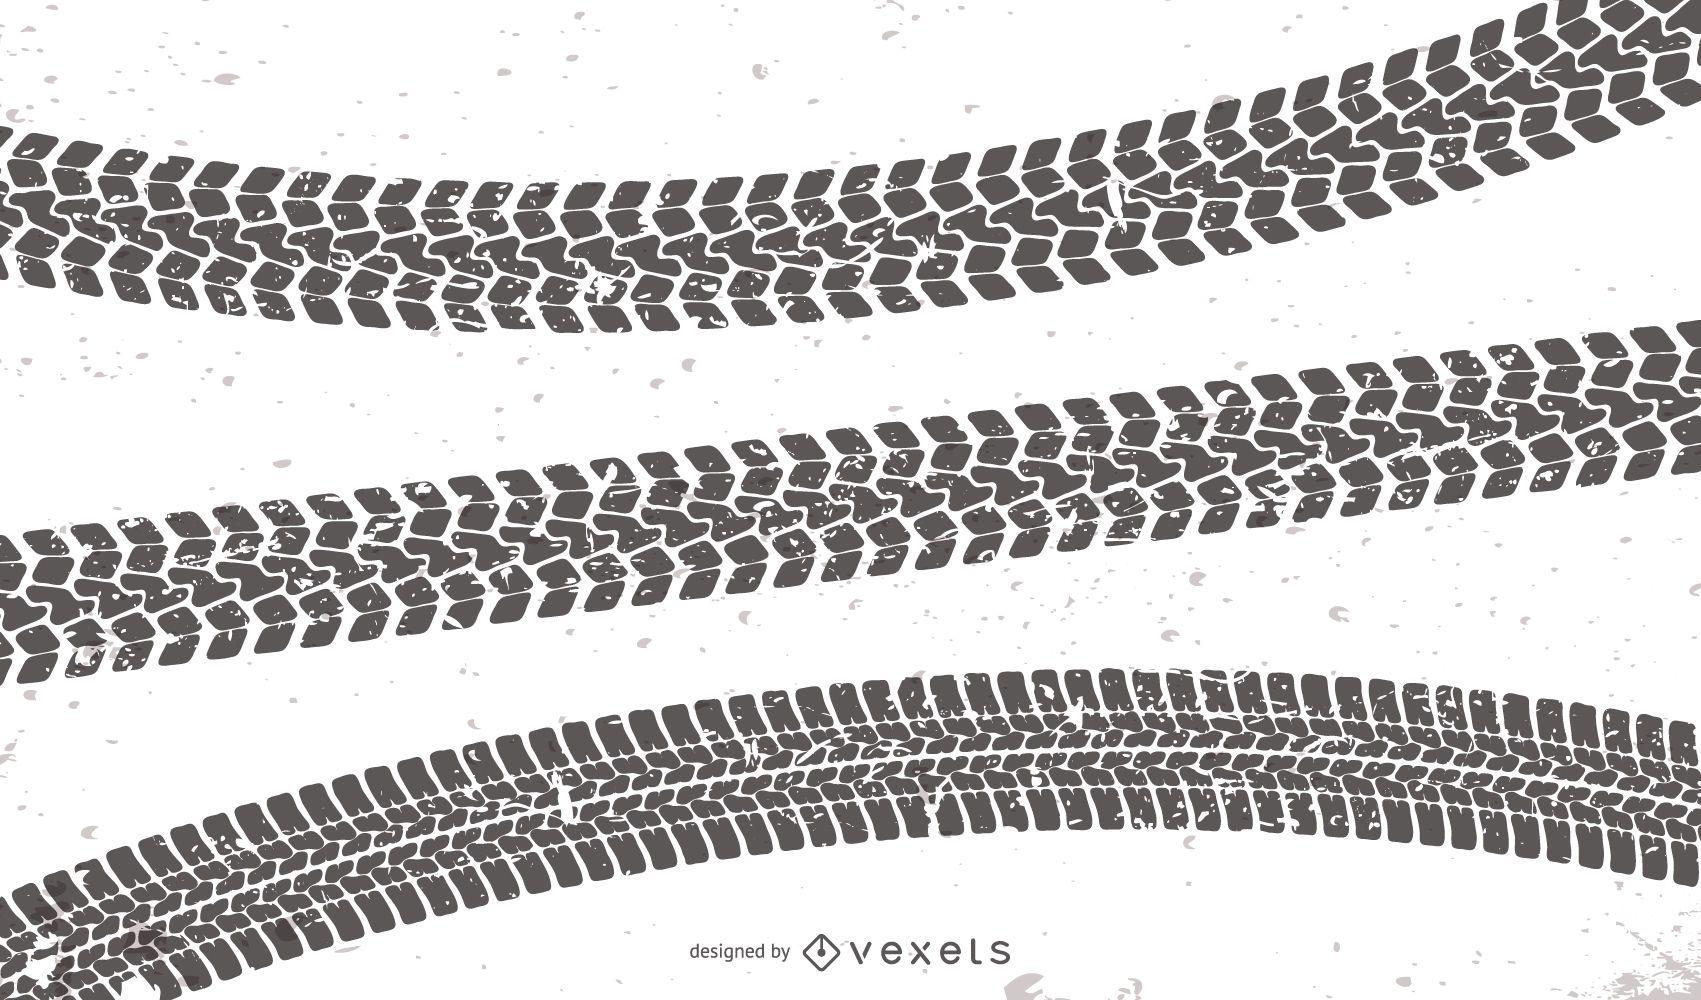 Marcas de pneus definidas